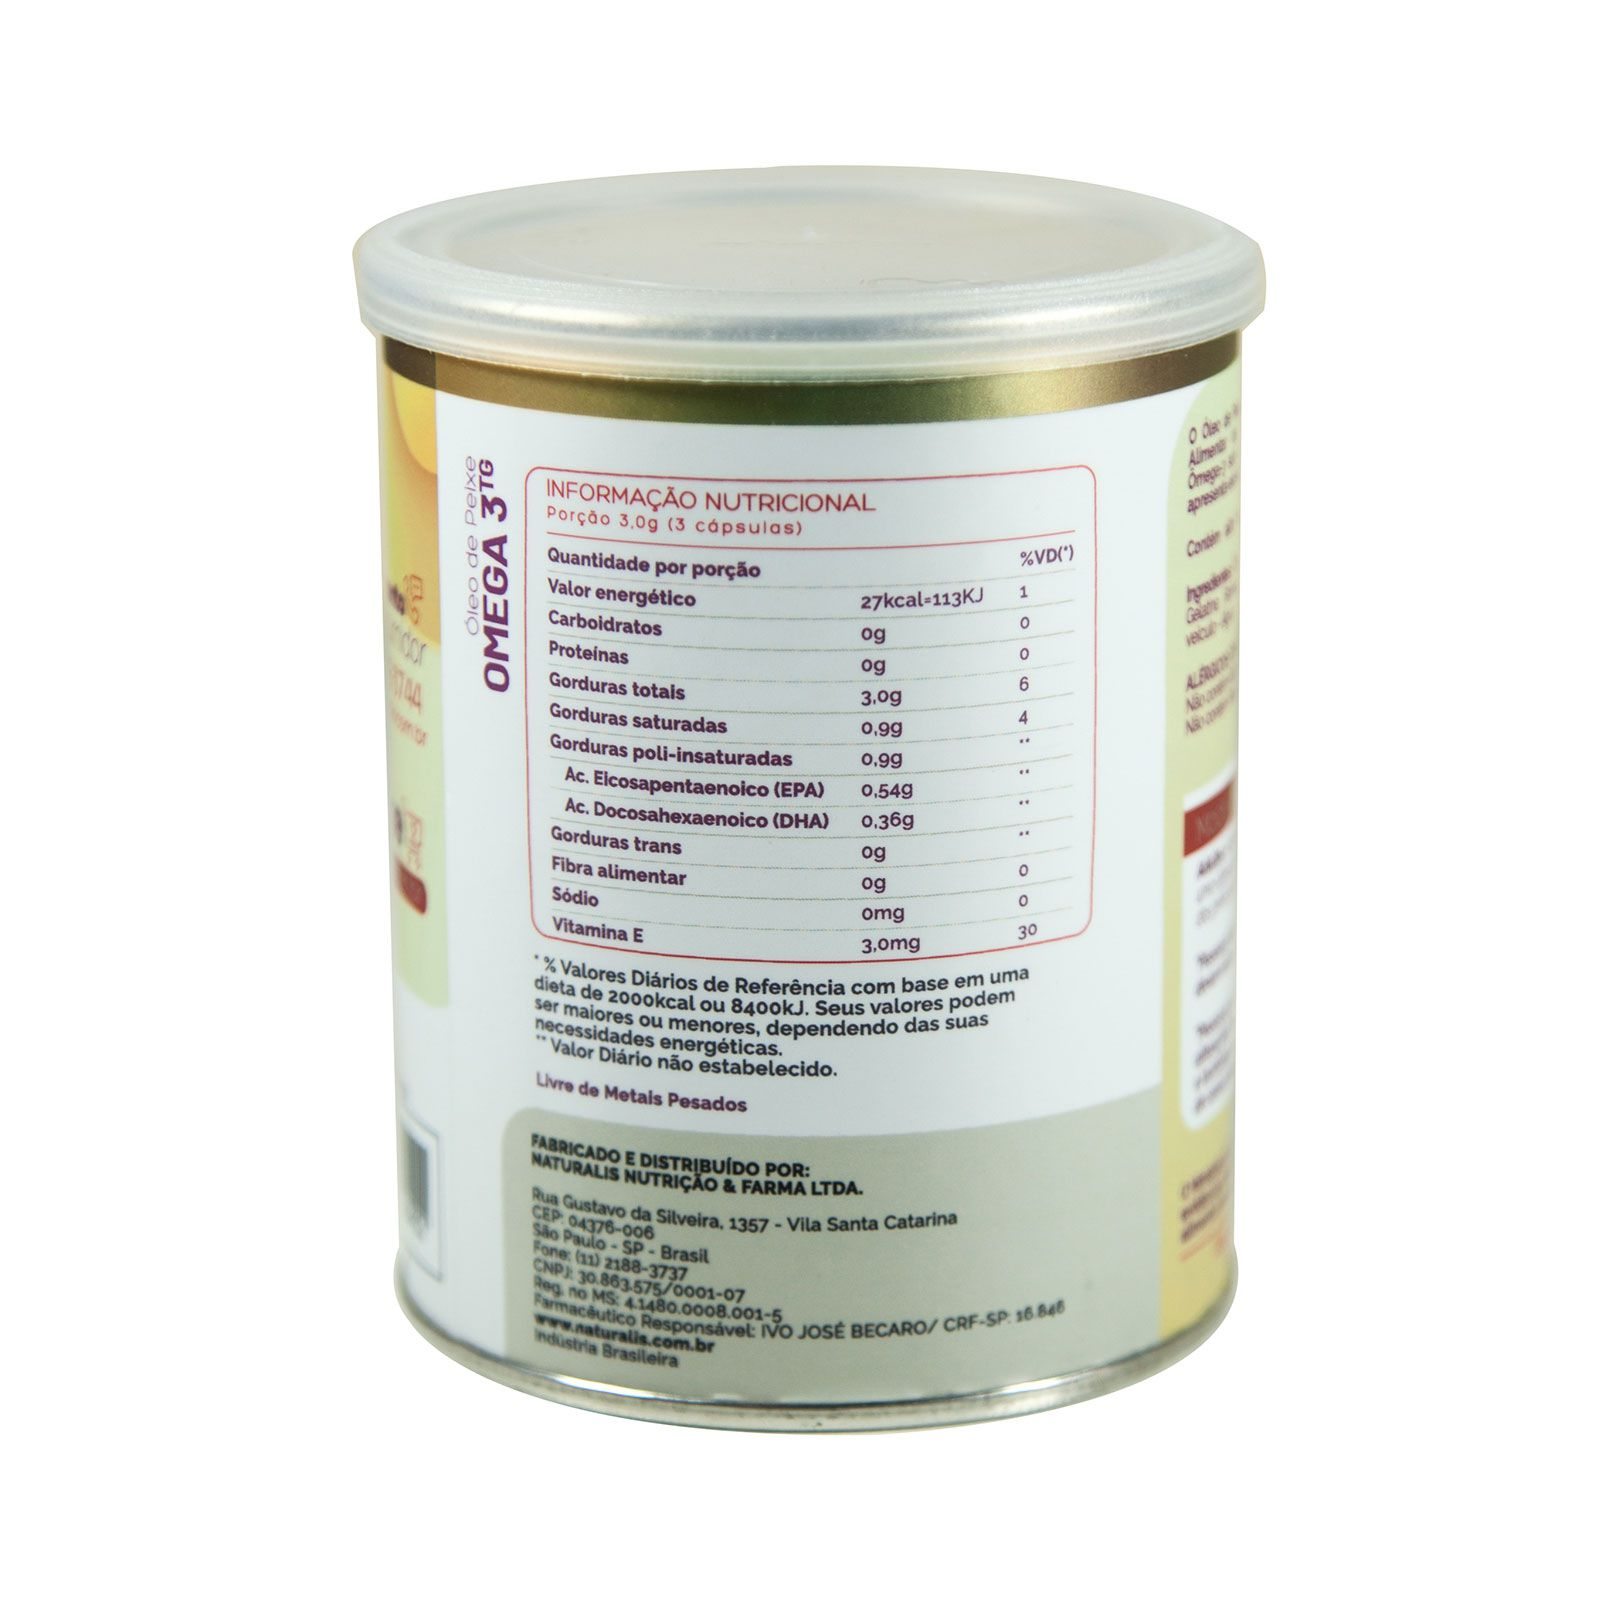 Óleo de Peixe Omega-3 Naturalis 100 Cápsulas